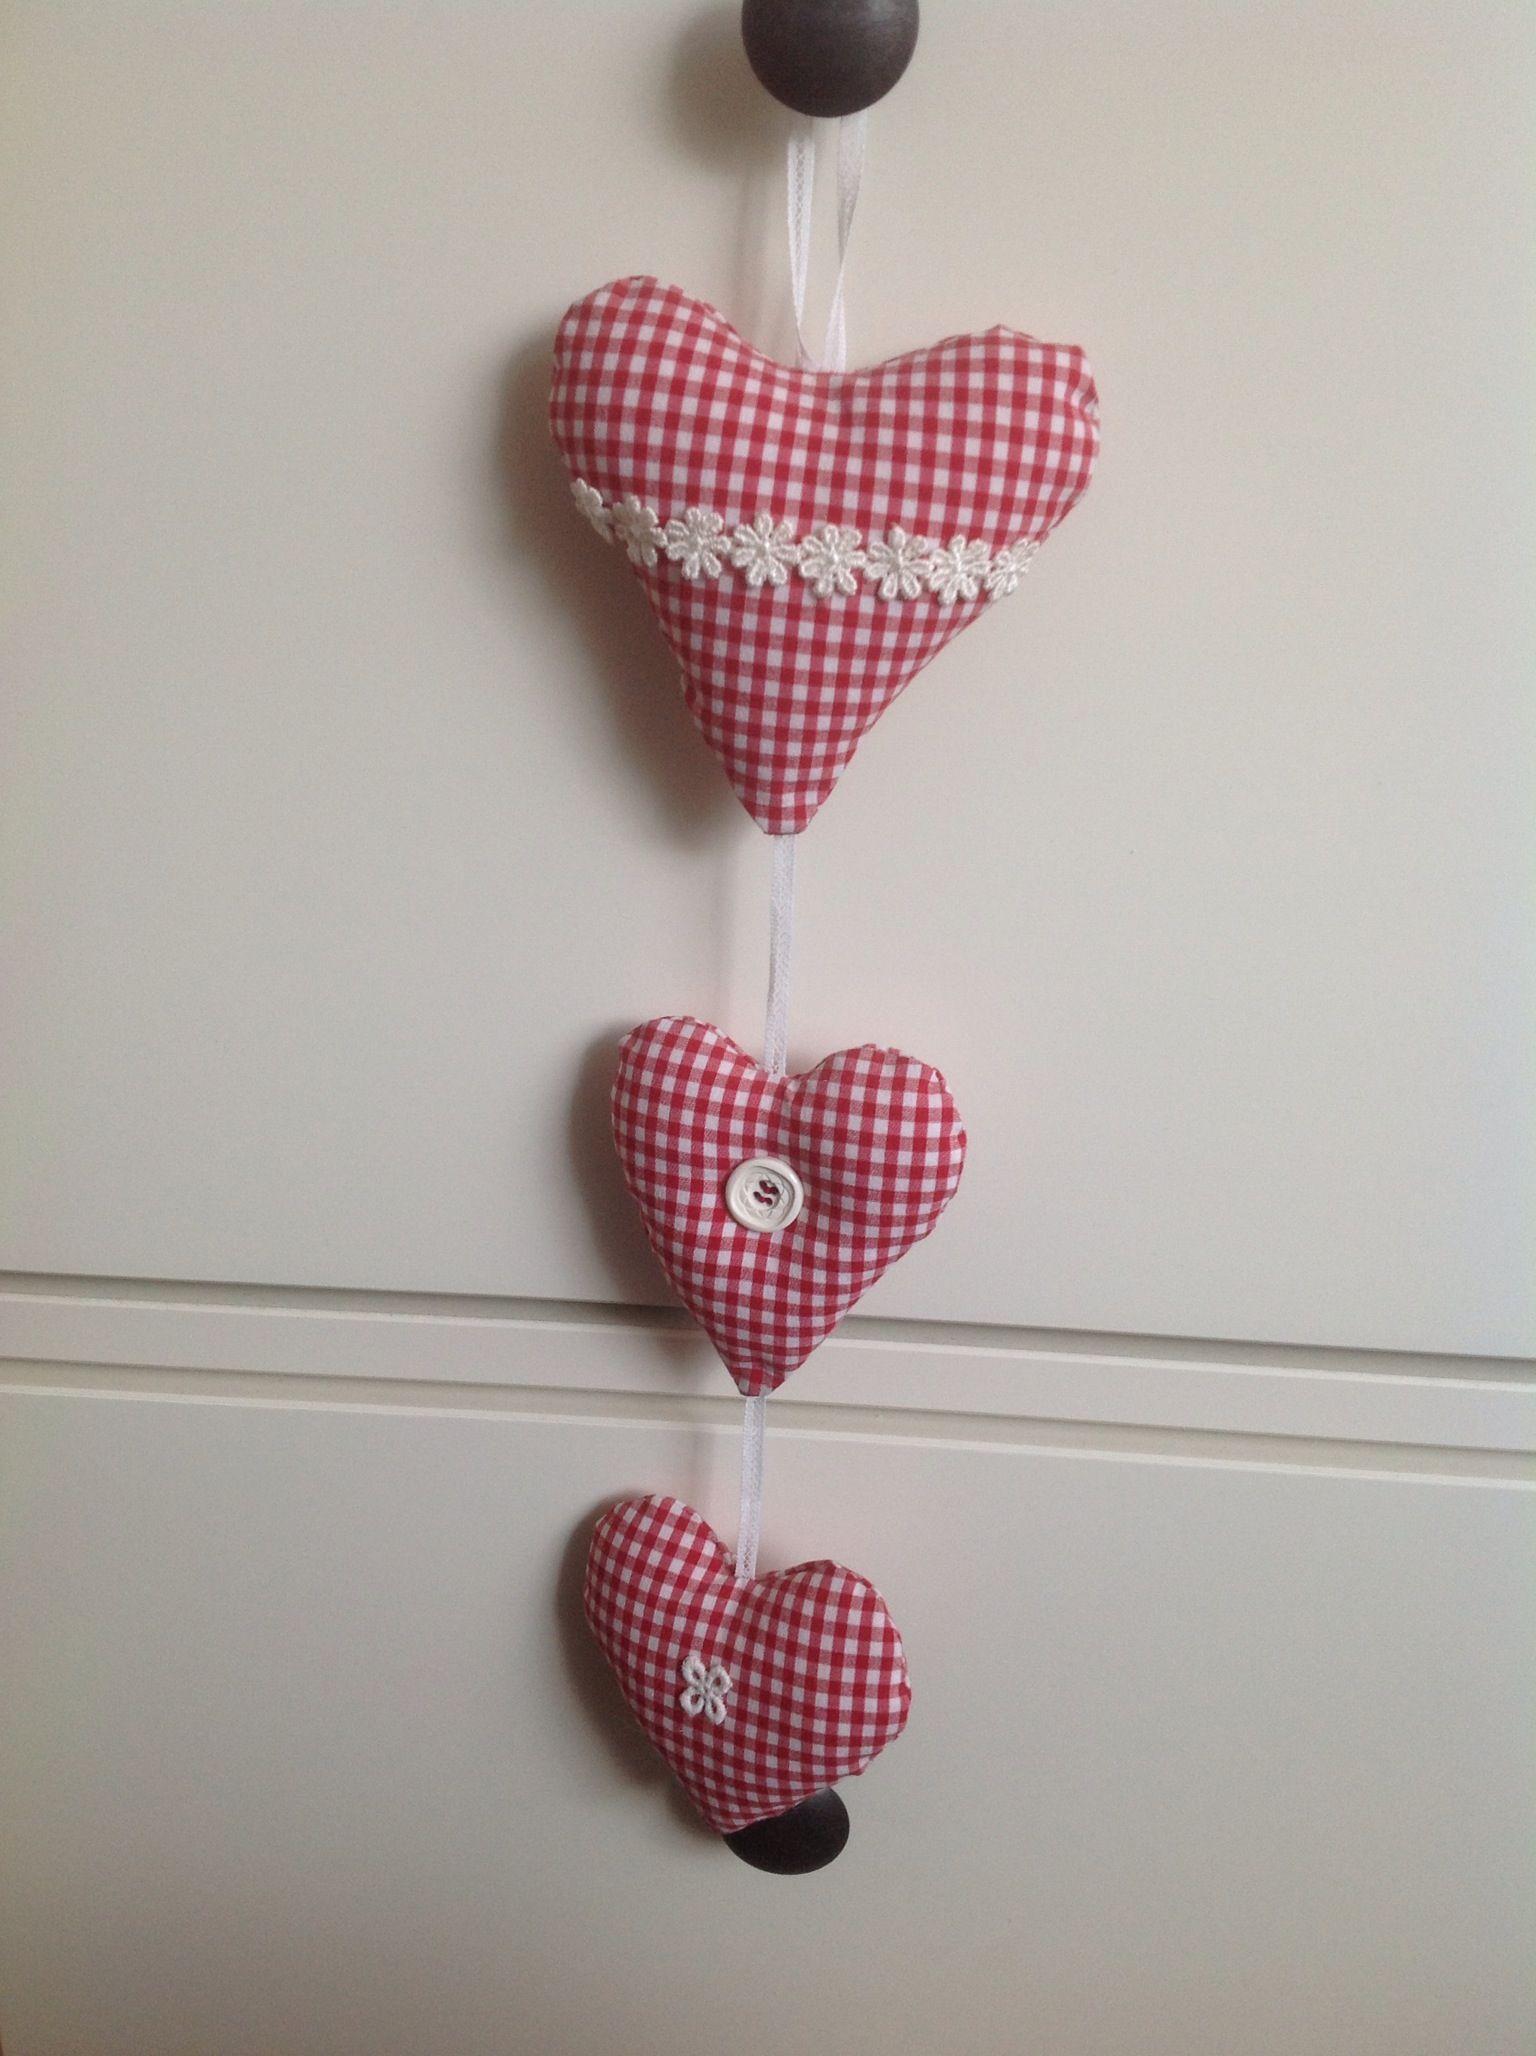 Drie rode hartjes